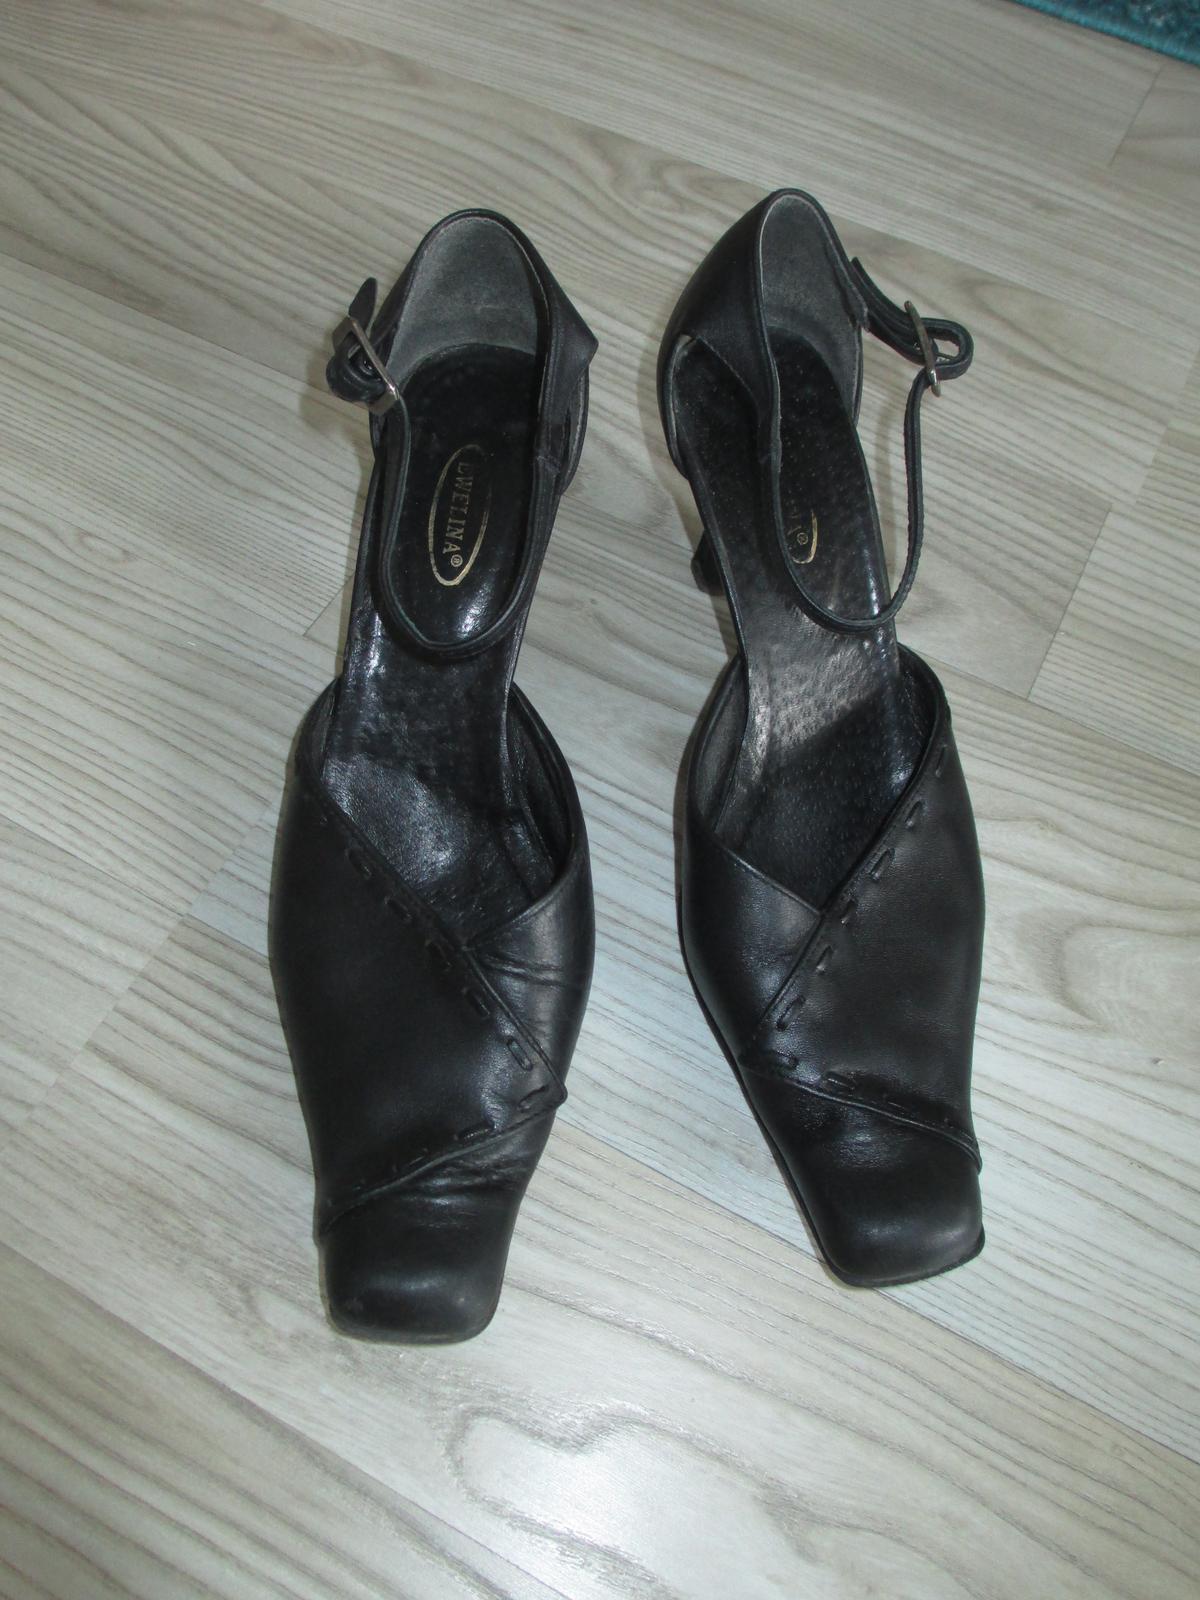 Plesové kožené boty vel 39/40  - Obrázek č. 1